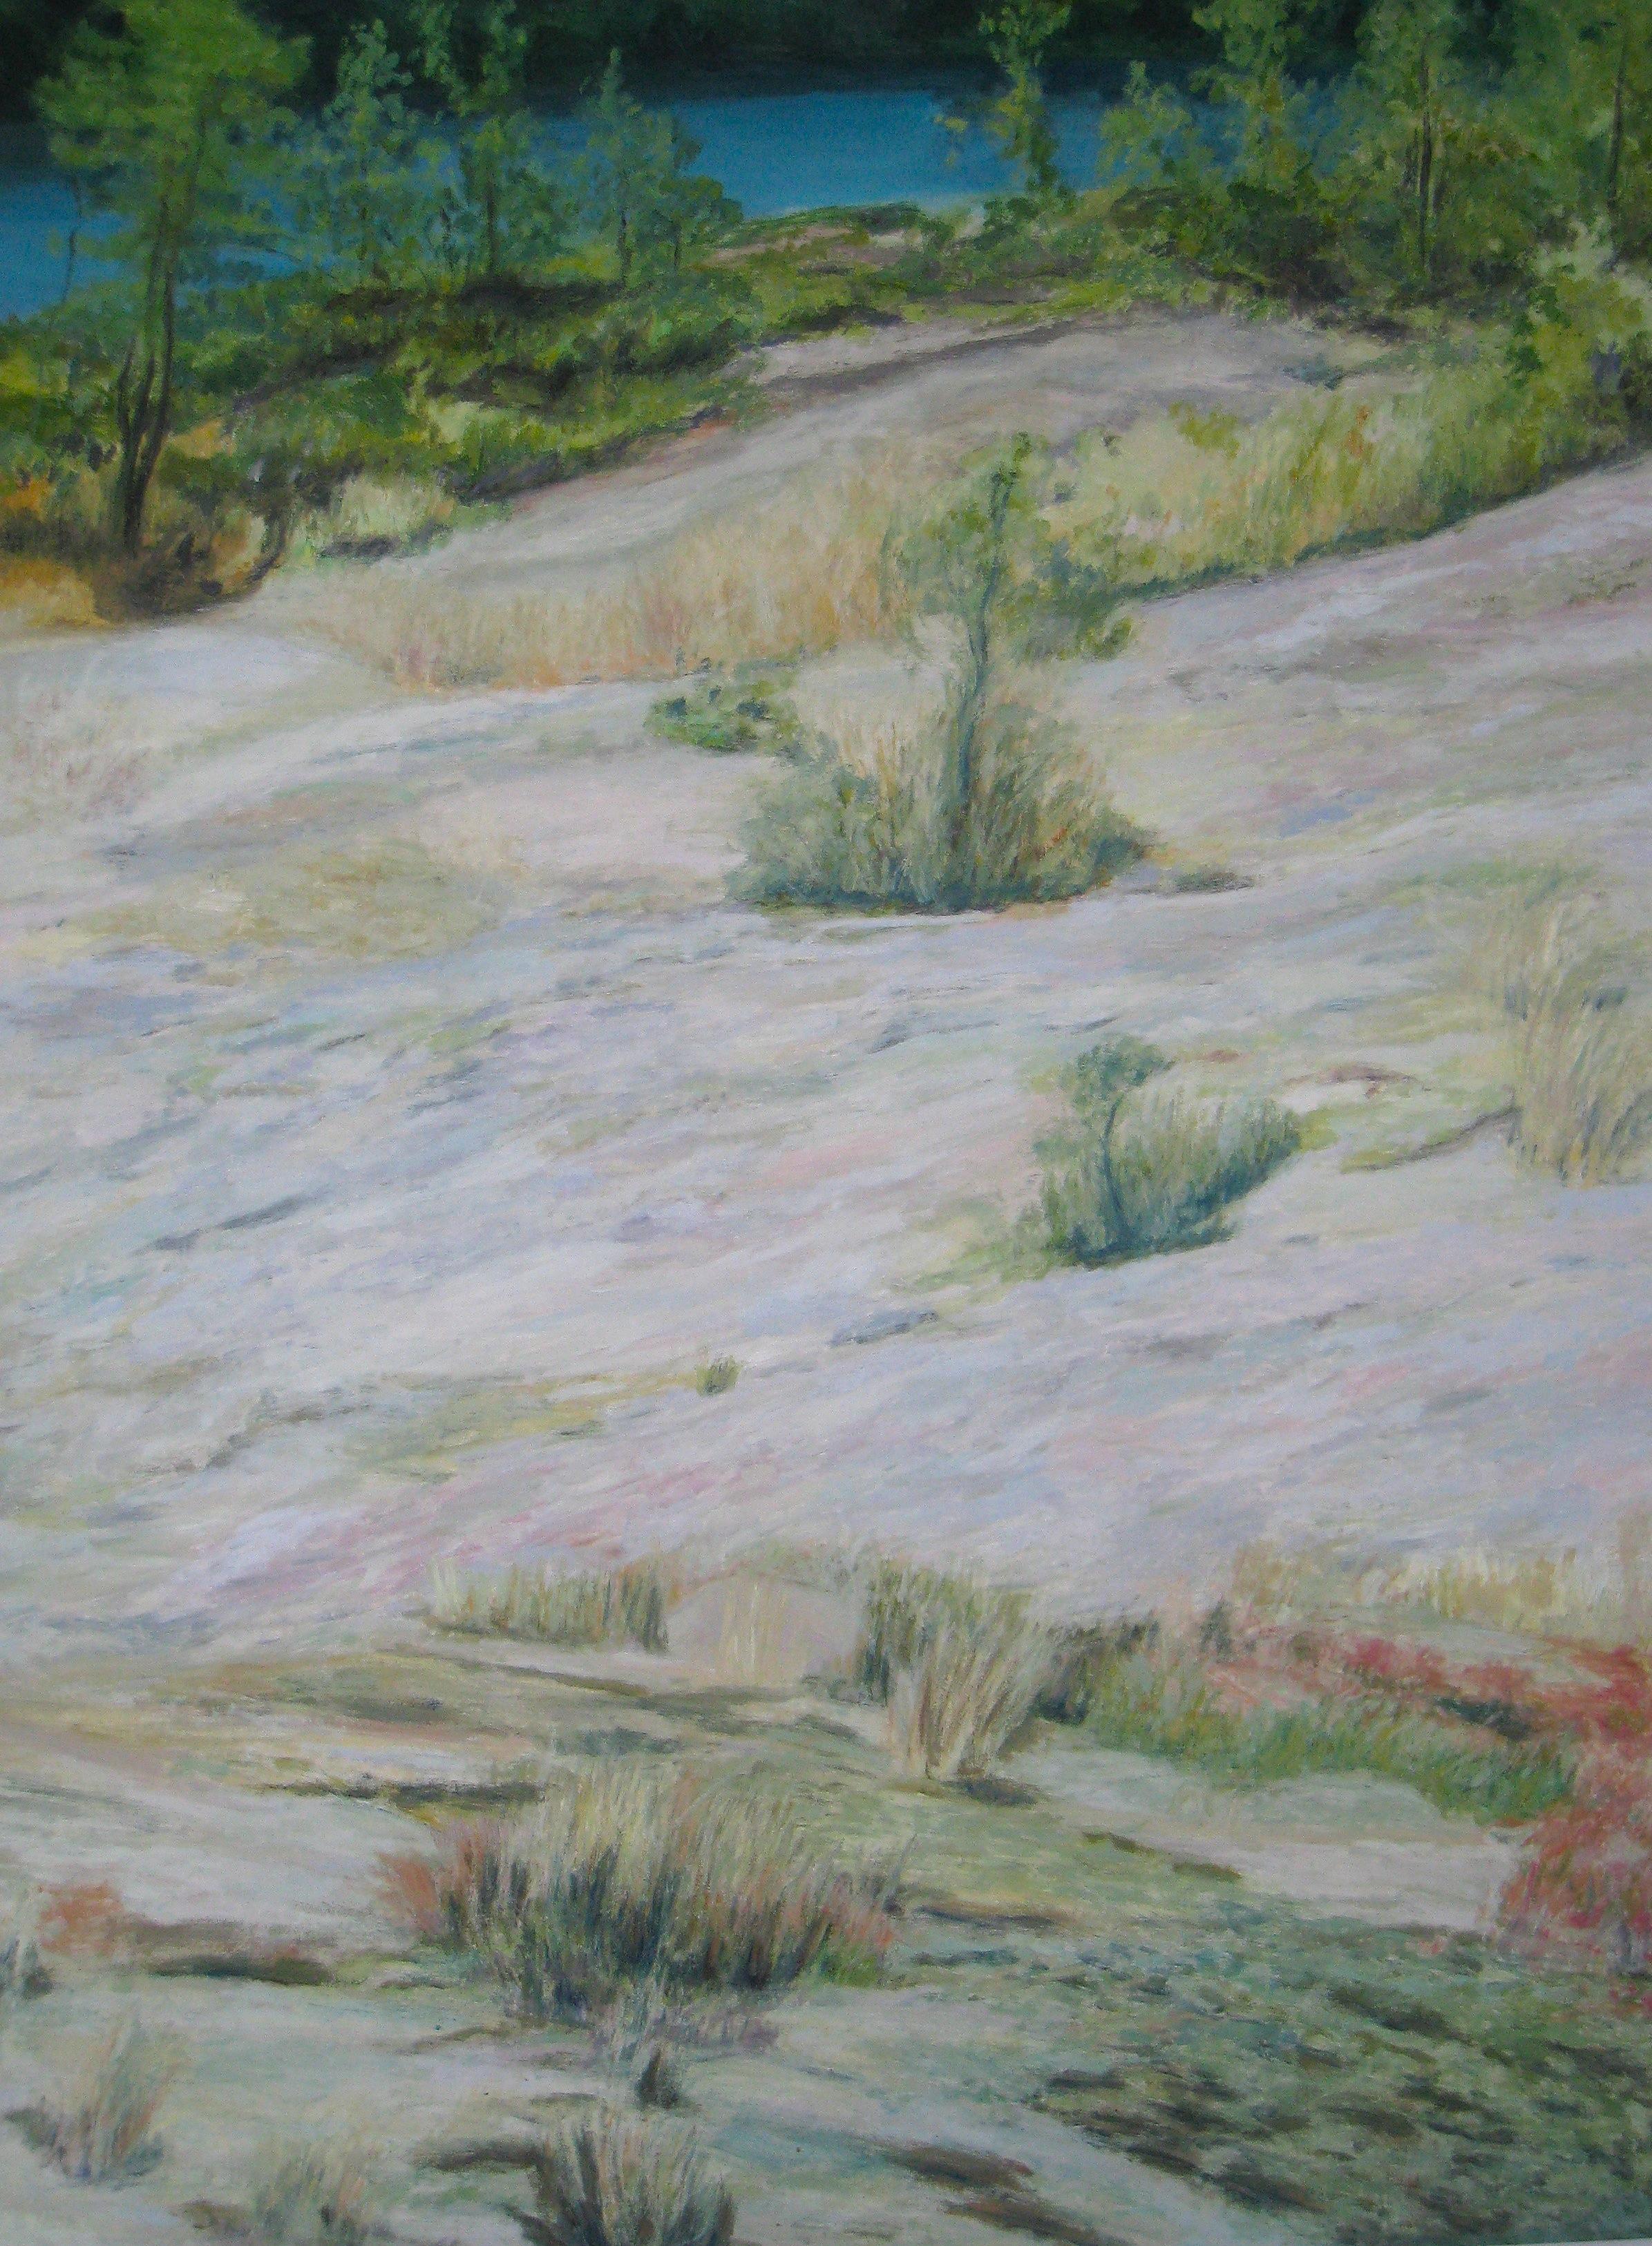 Swedish Hillside, 2007, oil, canvas, 70 x 50 in, SOLD